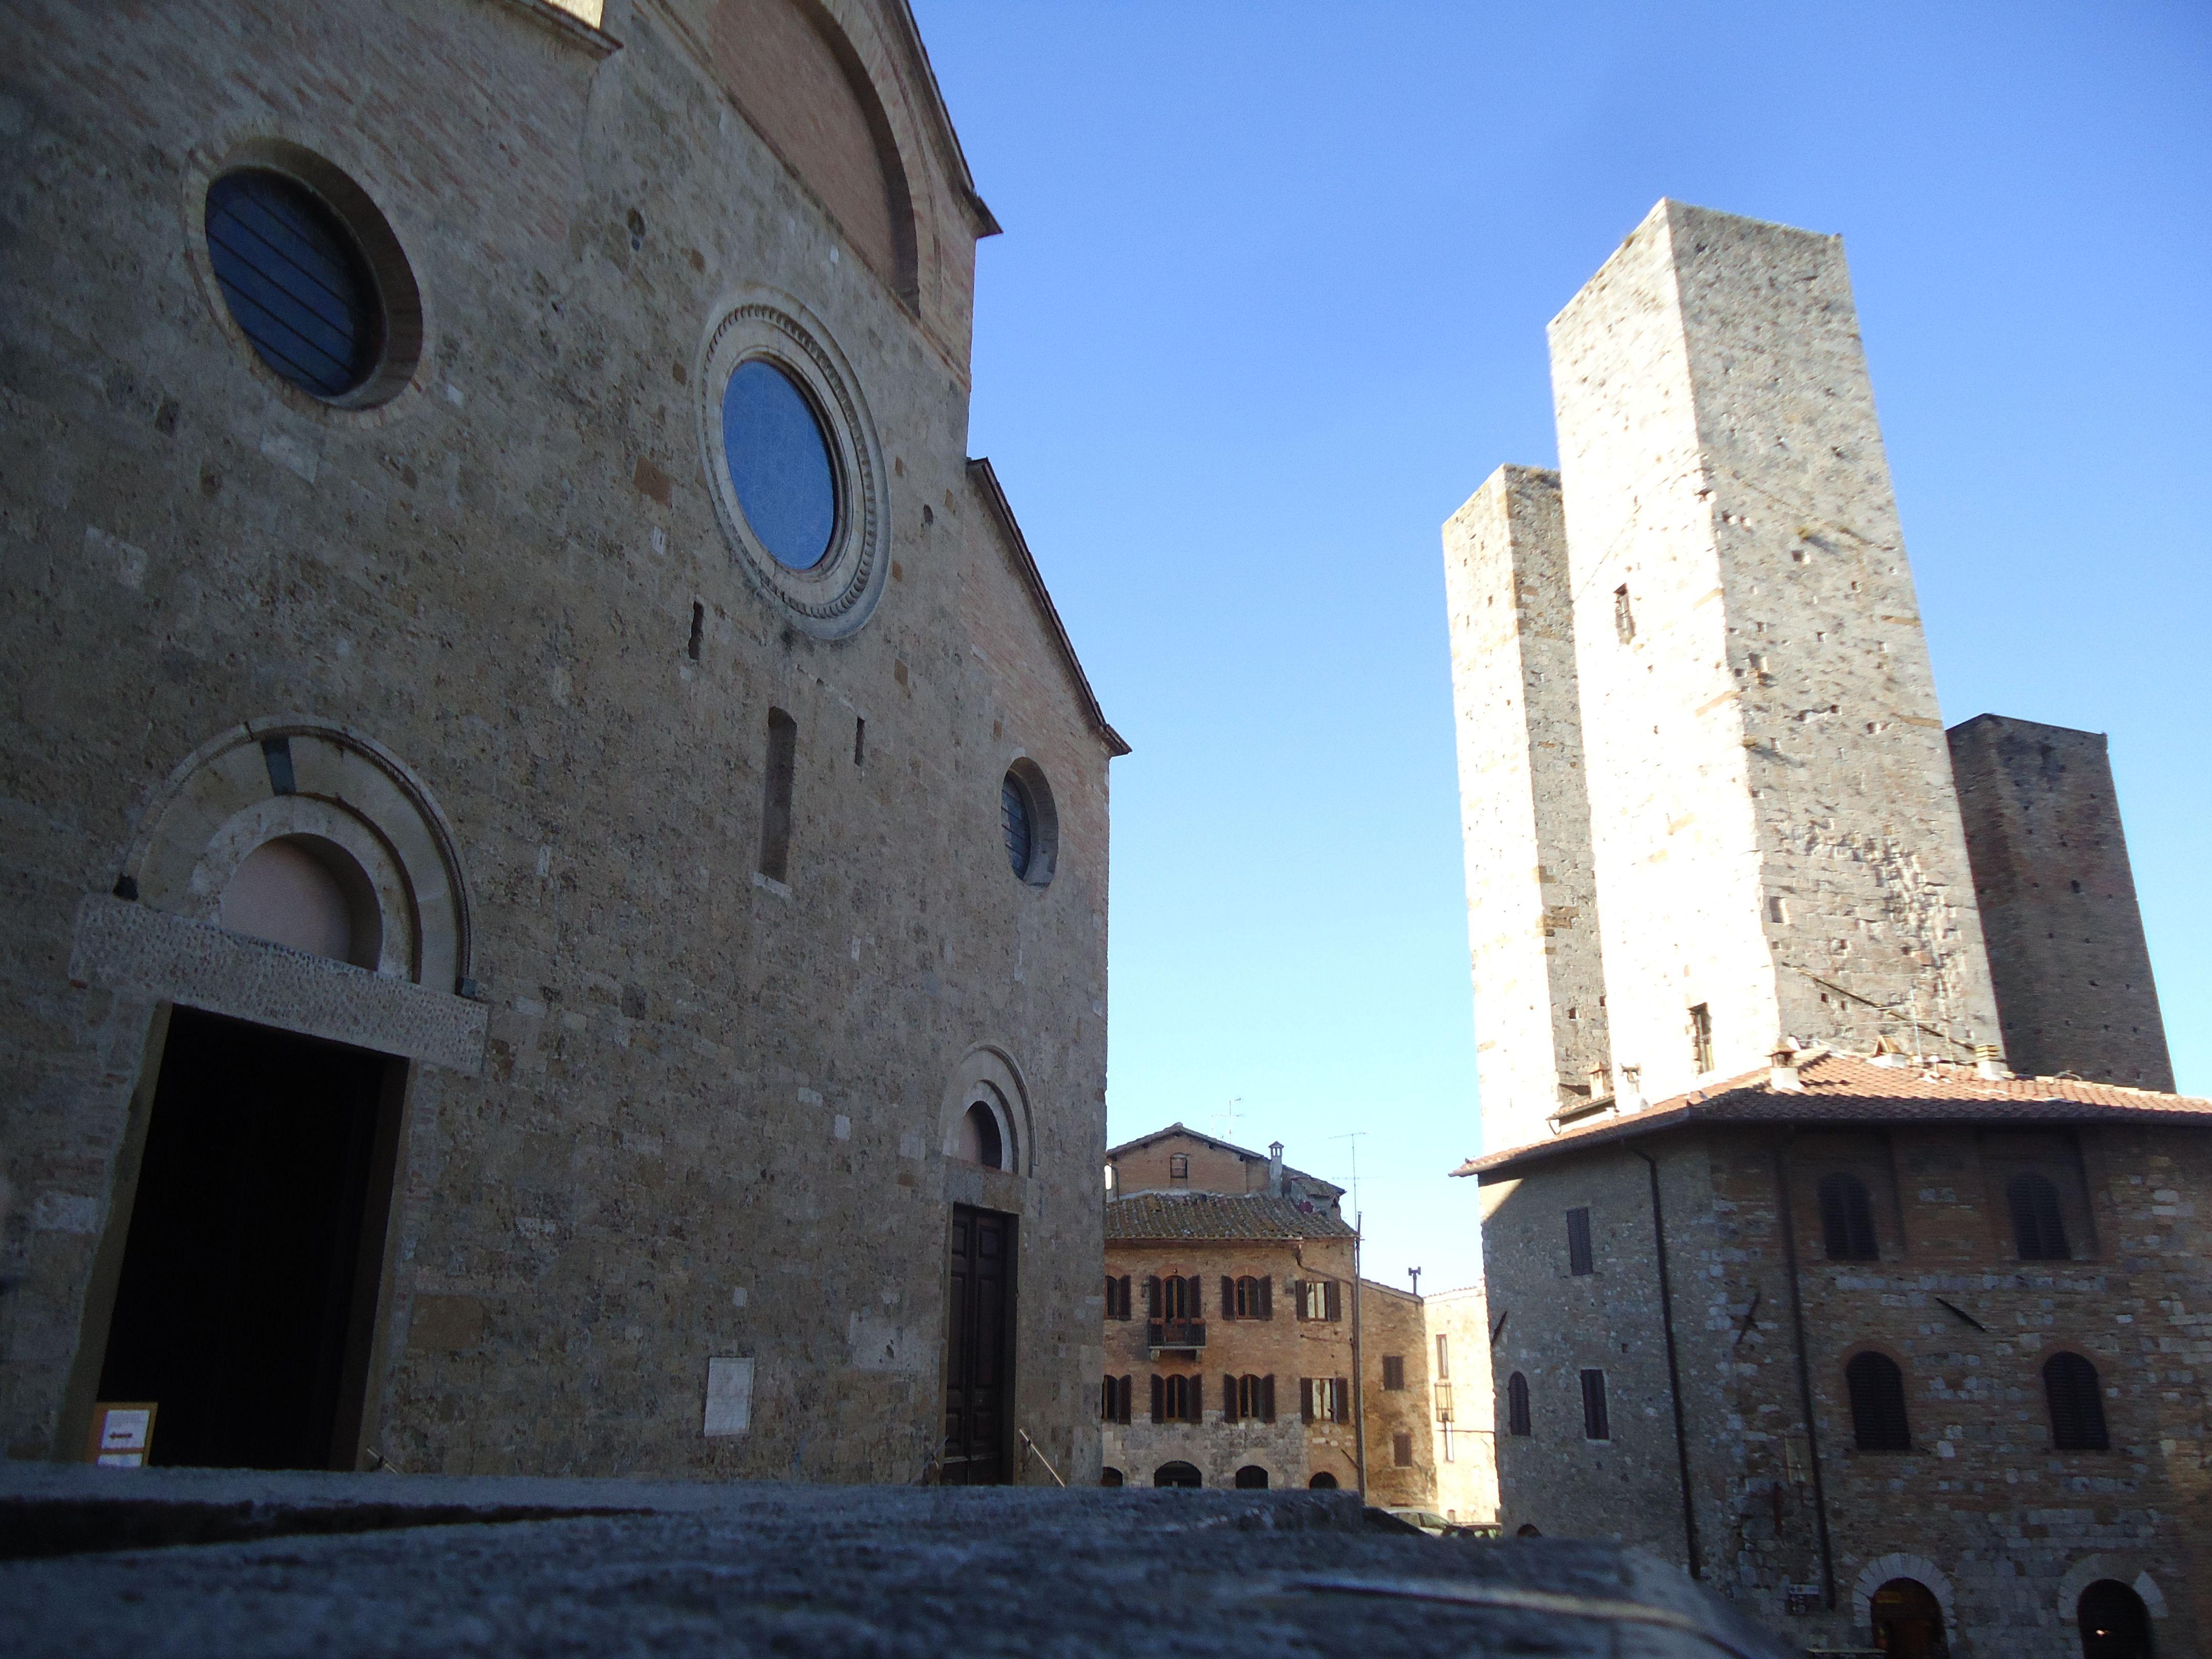 Duomo e torri gemelle a San Gimignano, A 2 km. dall'agriturismo Polveraia